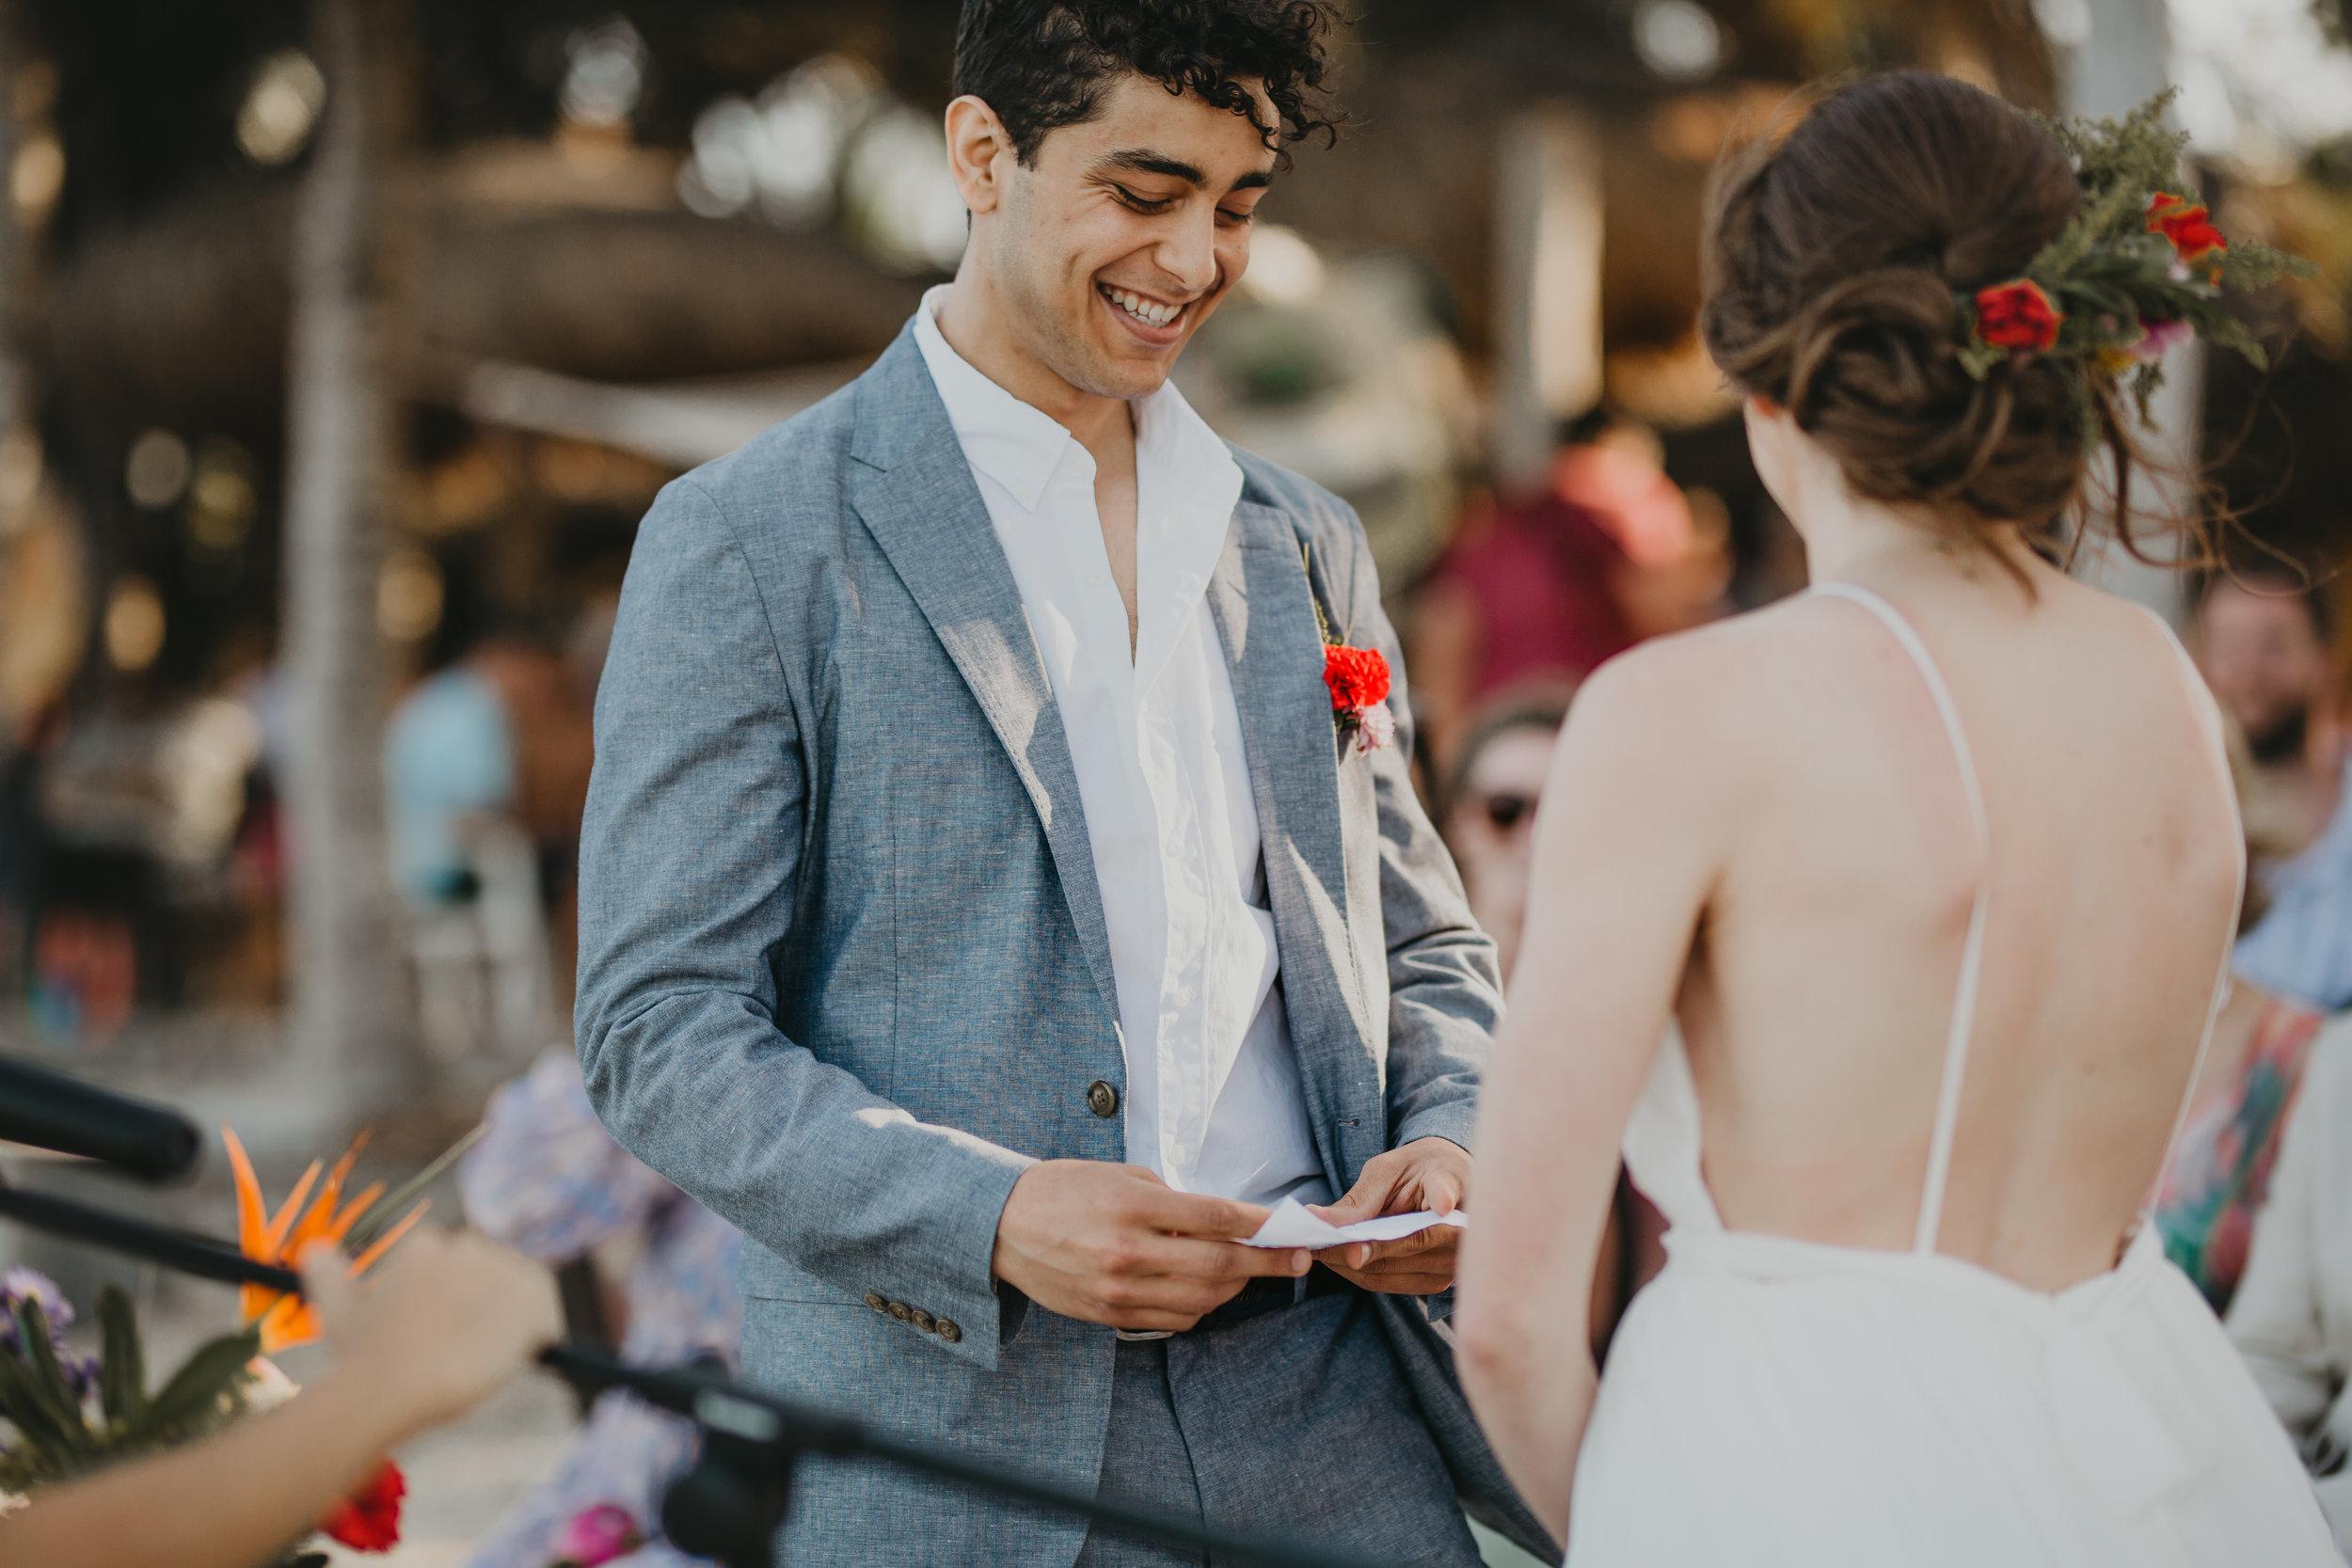 Nicole-Daacke-Photography-beachfront-akumal-destionation-wedding-tulum-mexico-elopement-photographer-destination-wedding-inspiration-sunset-champagne-pop-boho-bride-ocean-tropical-bohemian-tulum-wedding-photos-160.jpg